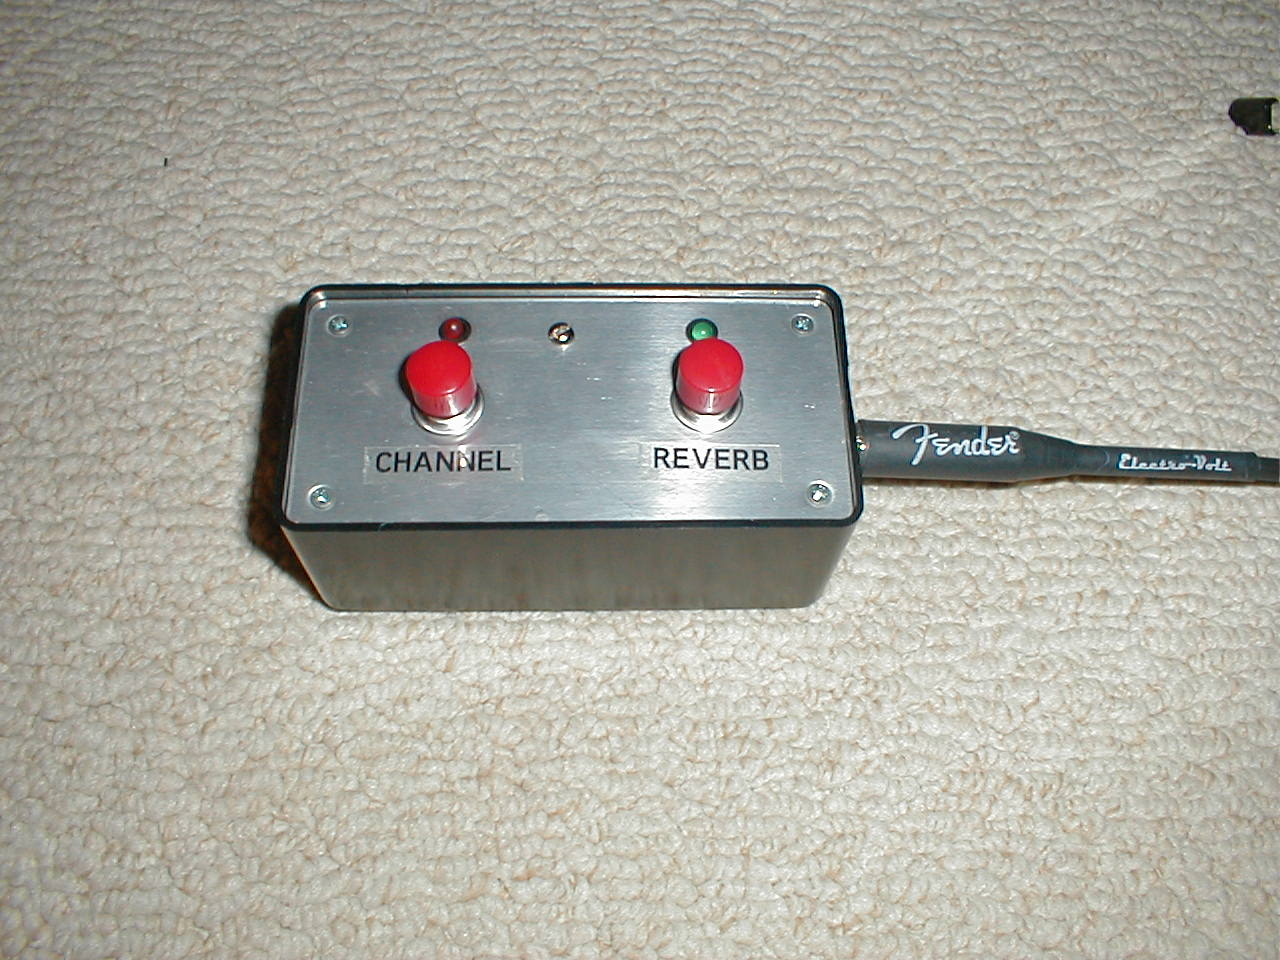 amplifier wiring kit radio shack blank venn diagram ibanez amp schematic get free image about